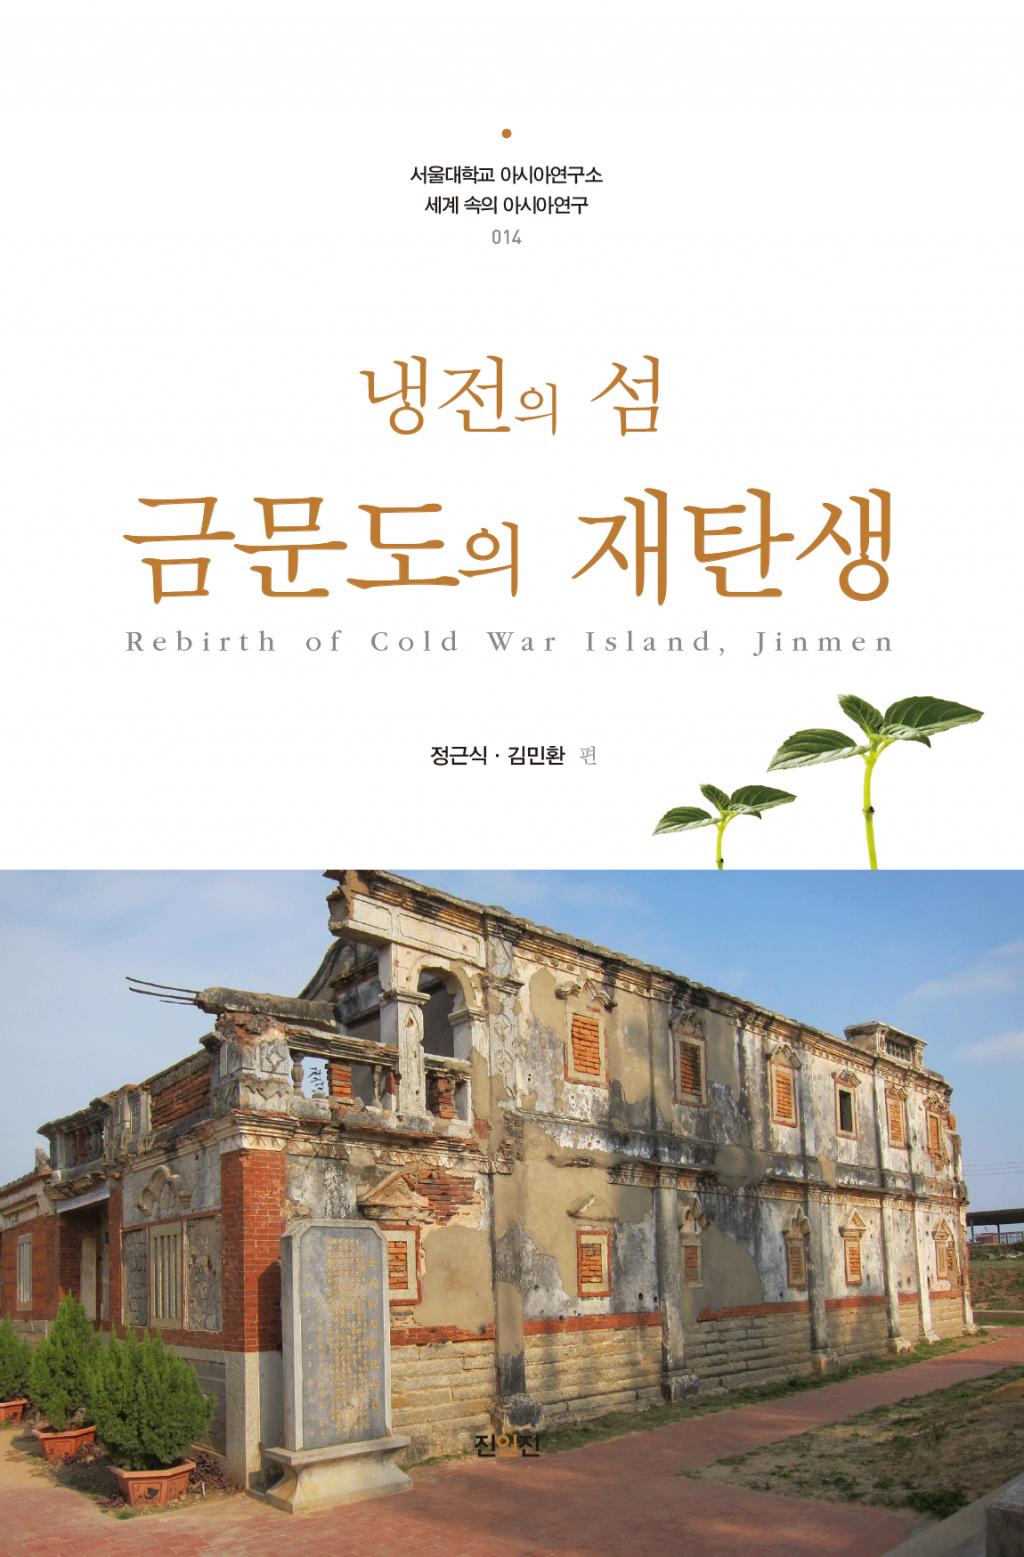 Rebirth of a Cold War Island, Jinmen